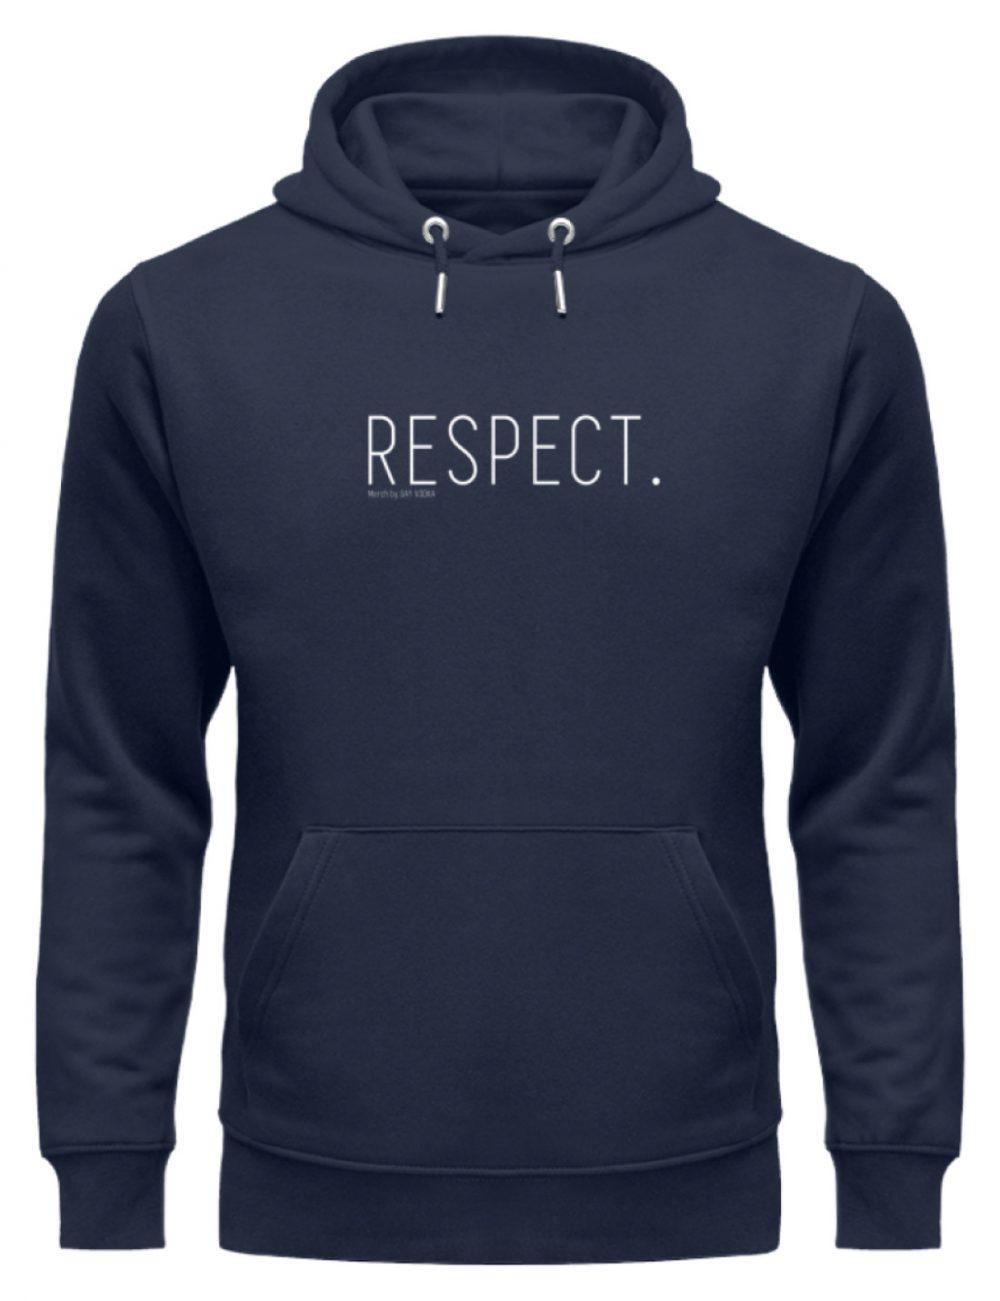 RESPECT. - Unisex Organic Hoodie-6887